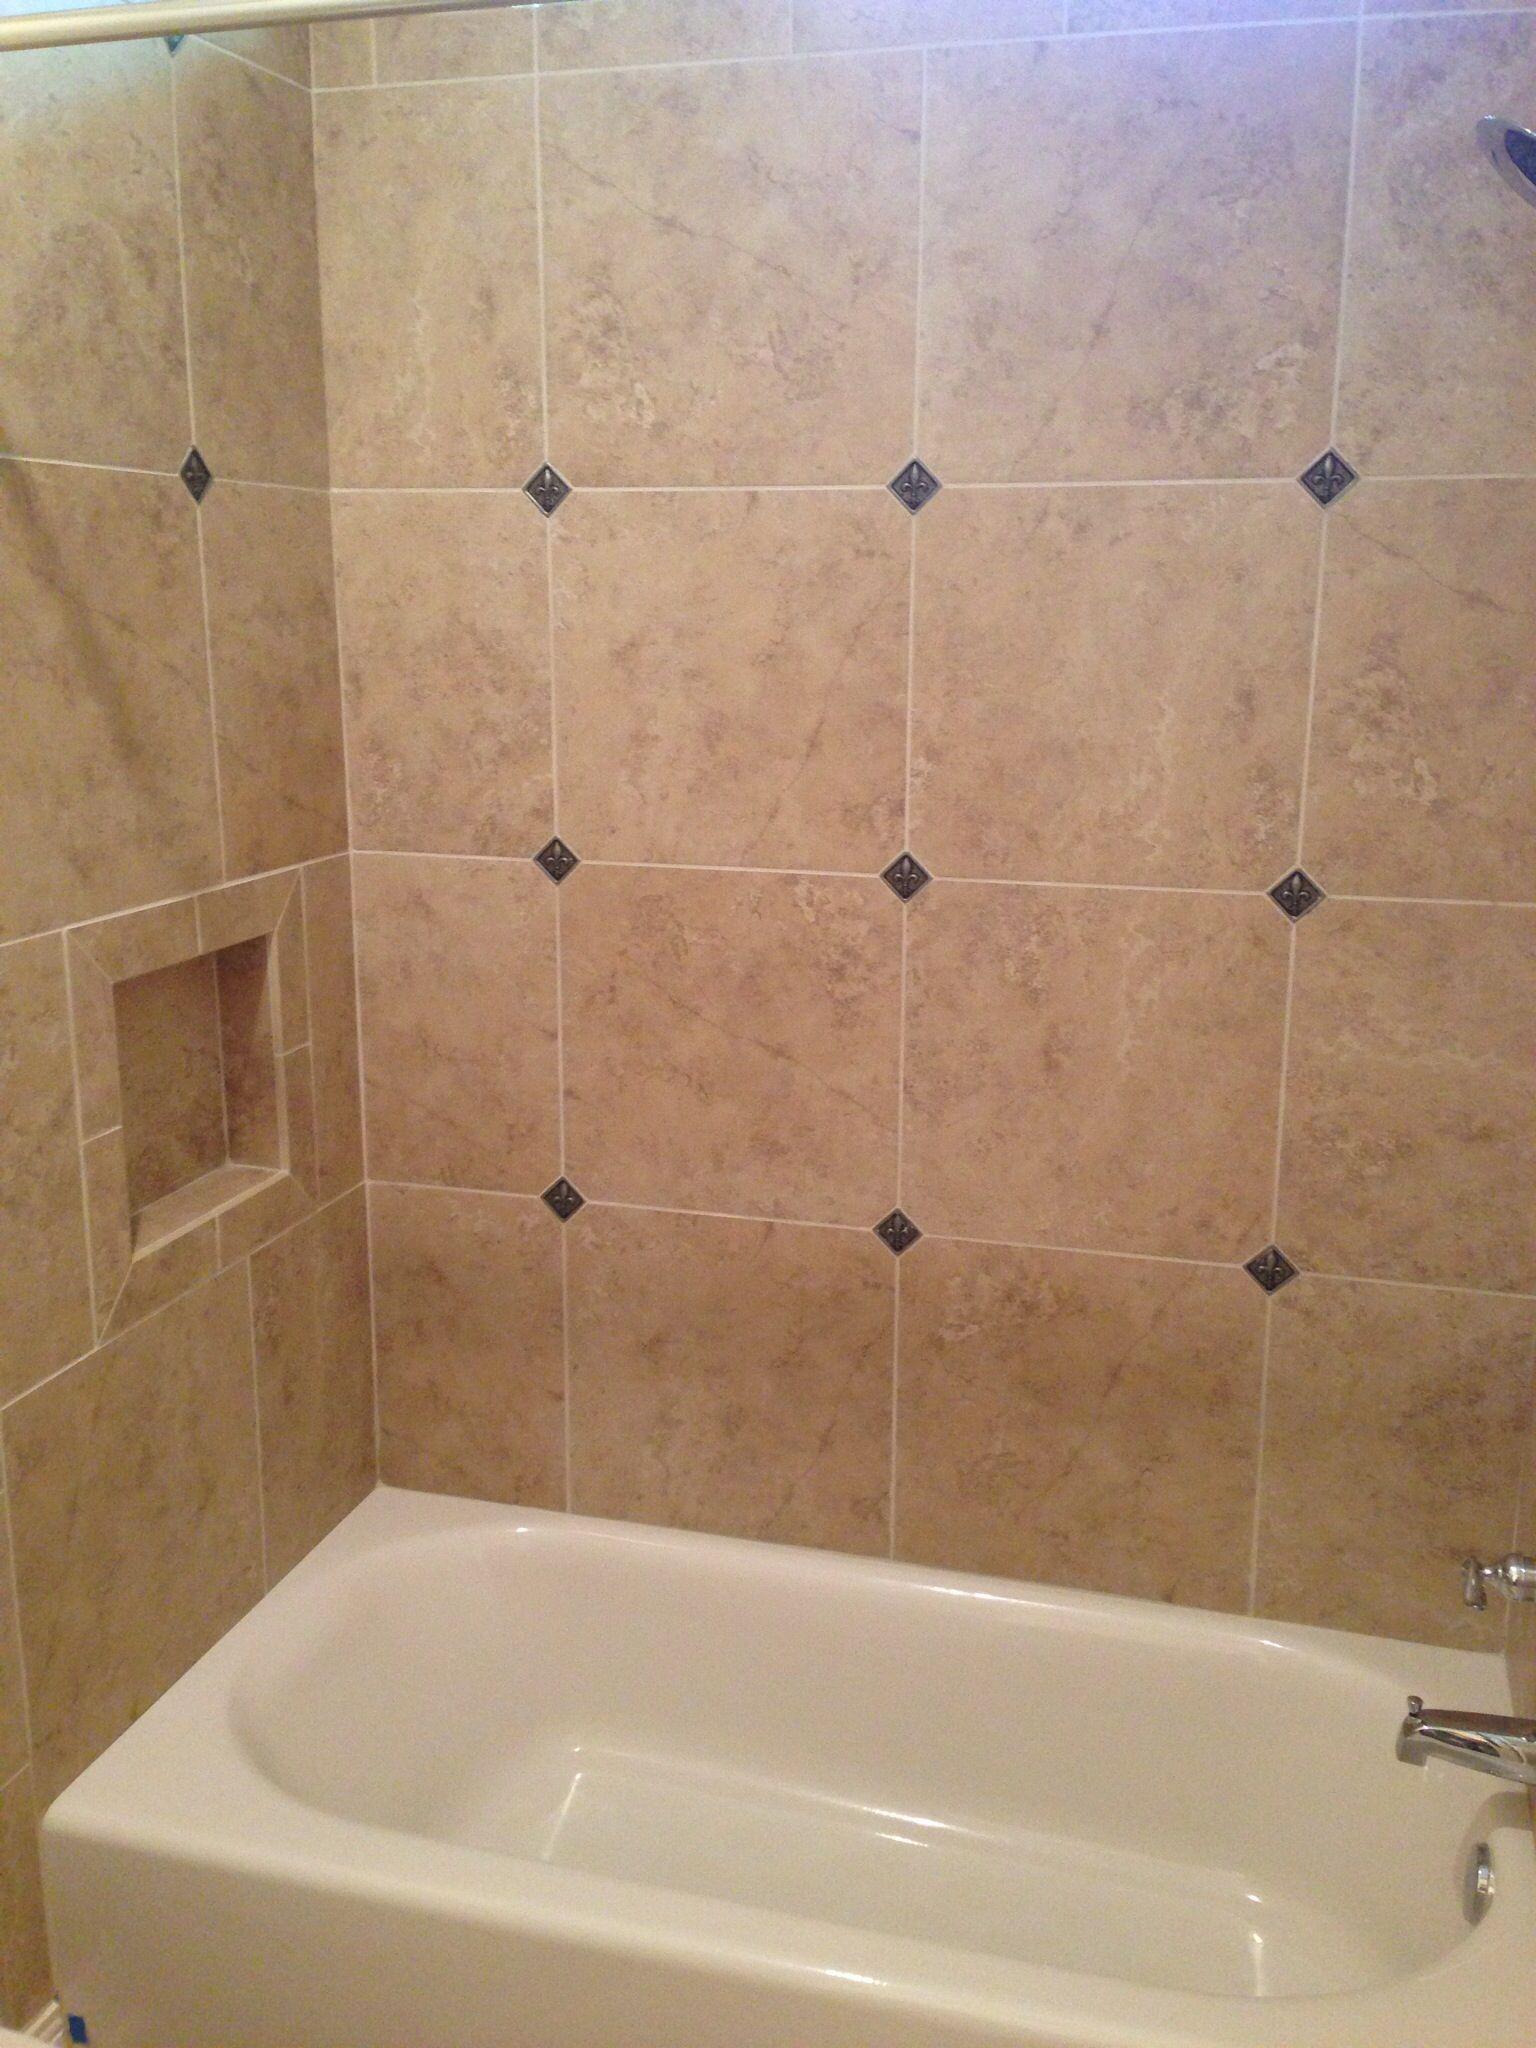 18x18 Tiles With 2 Square Medallions Bathroom Small Bathroom Bathroom Design